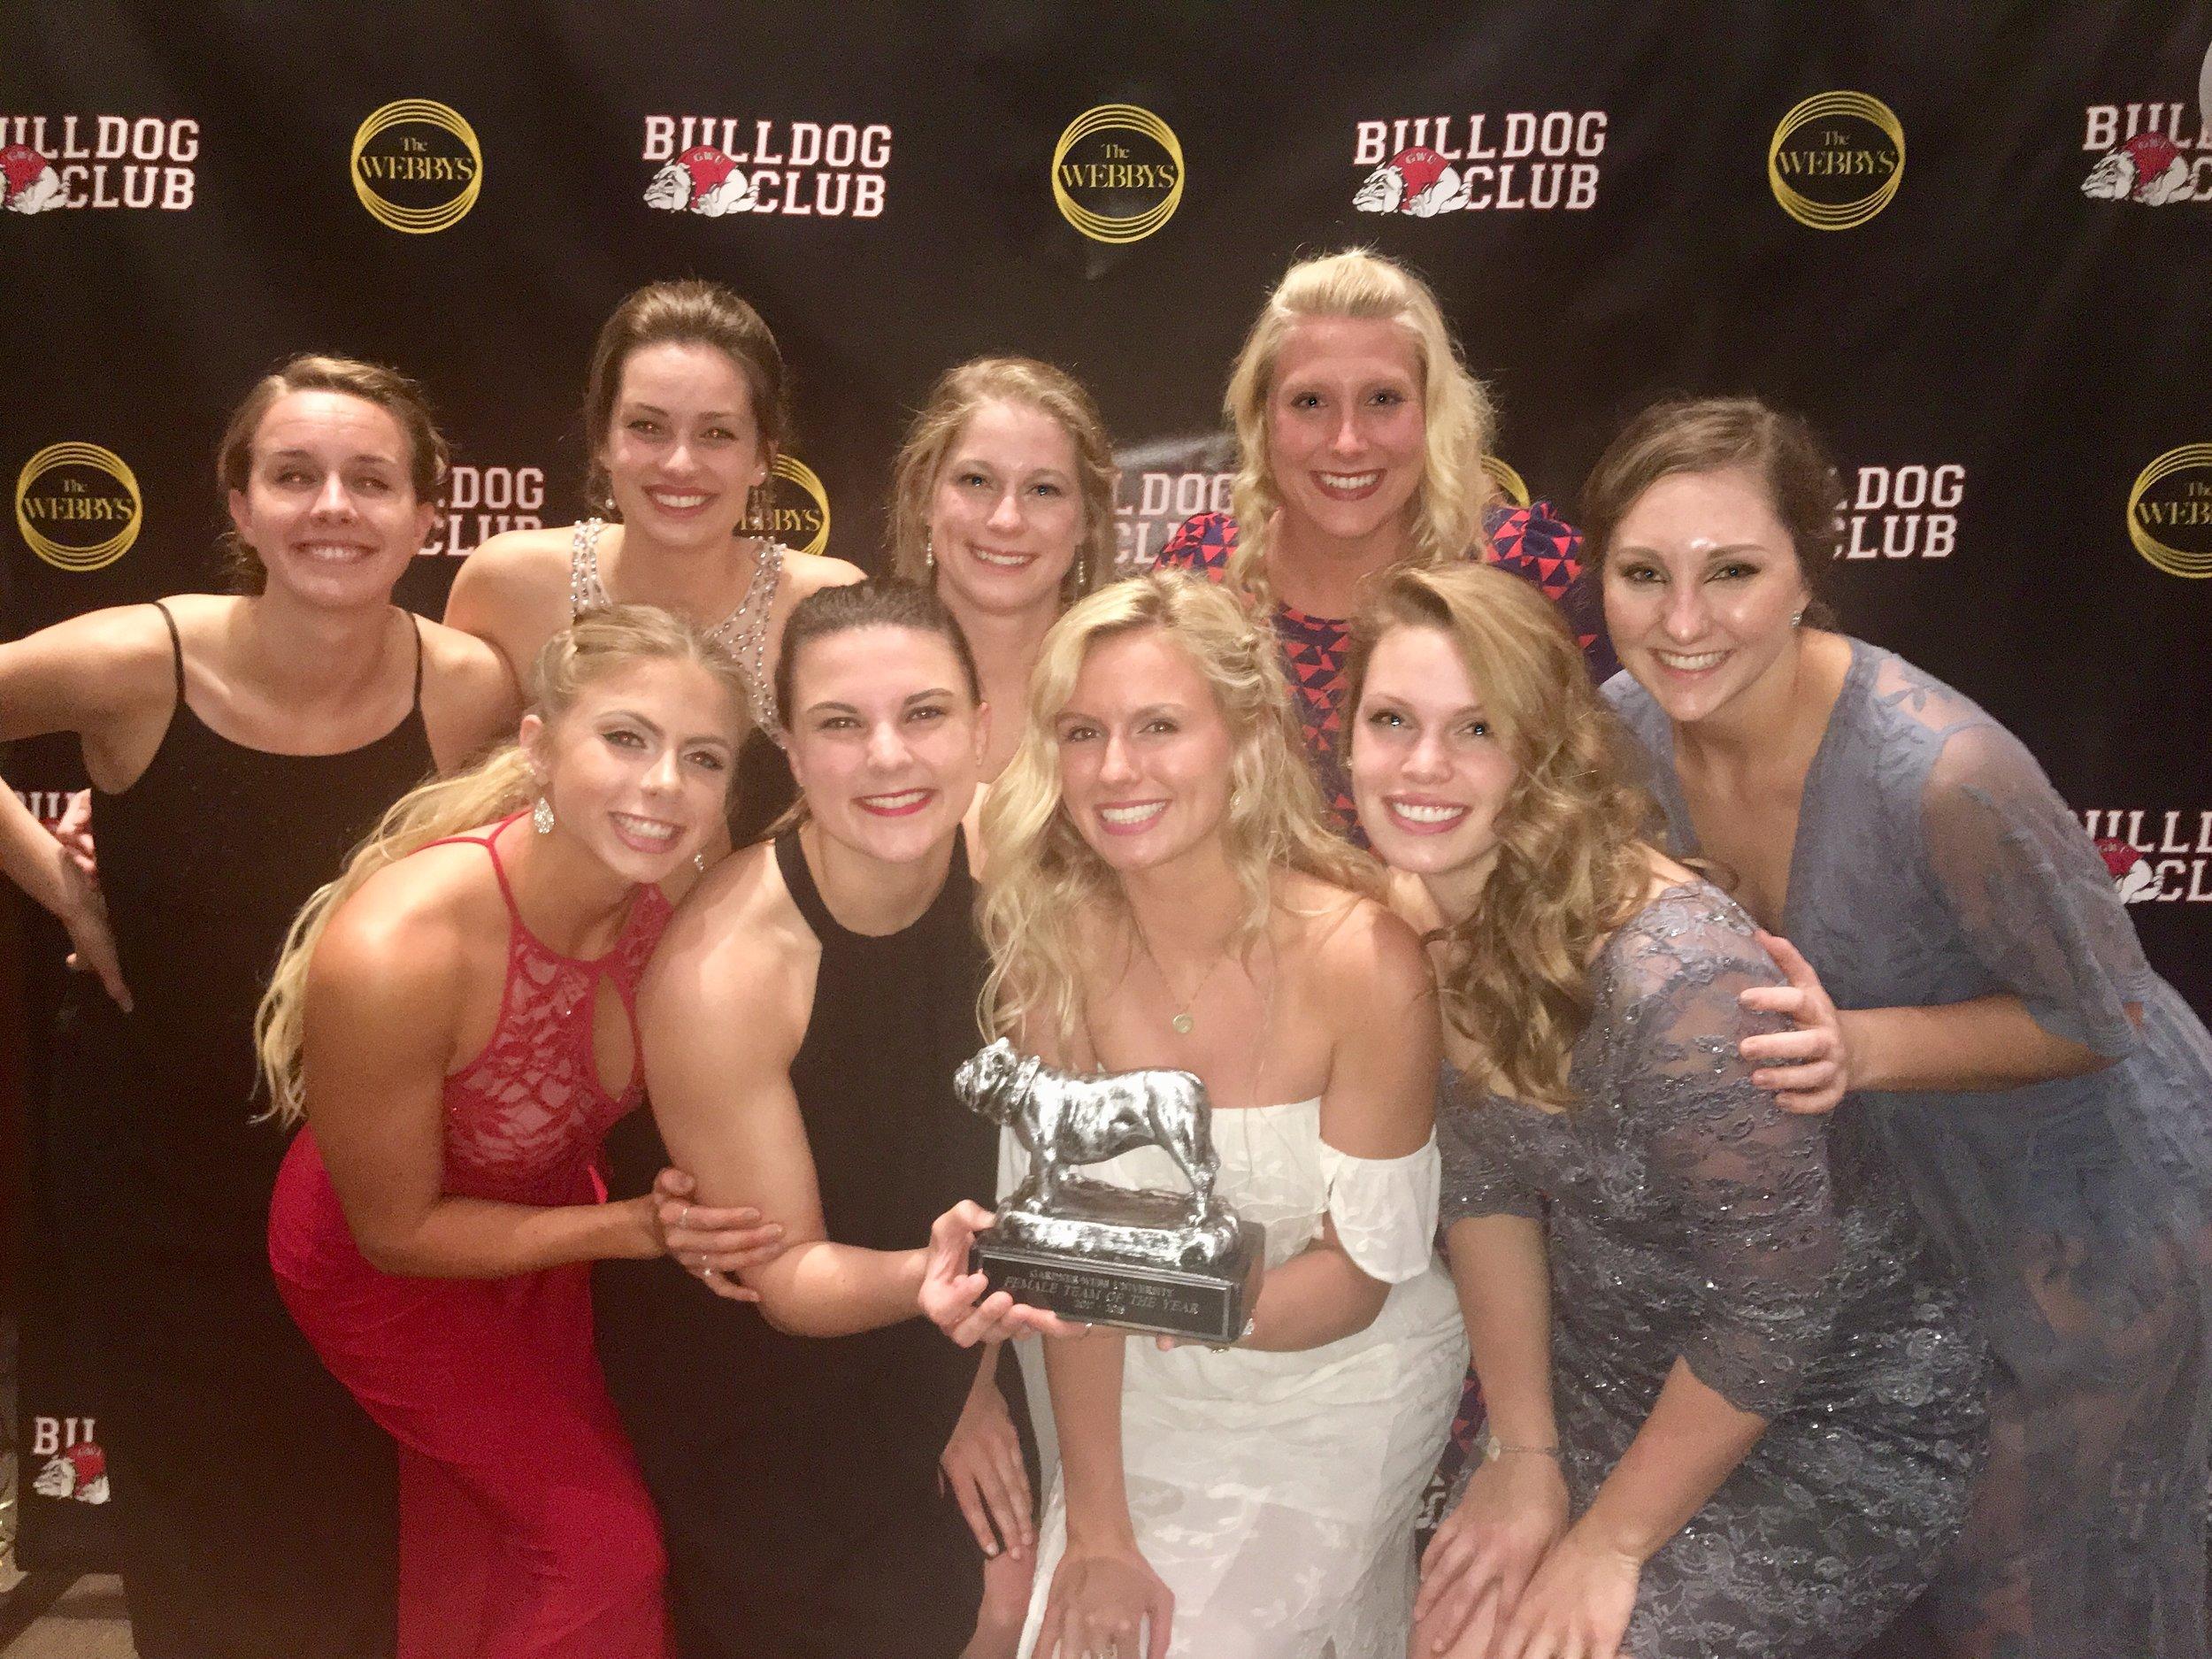 Members of the women's swim team holding up their Bulldog award.